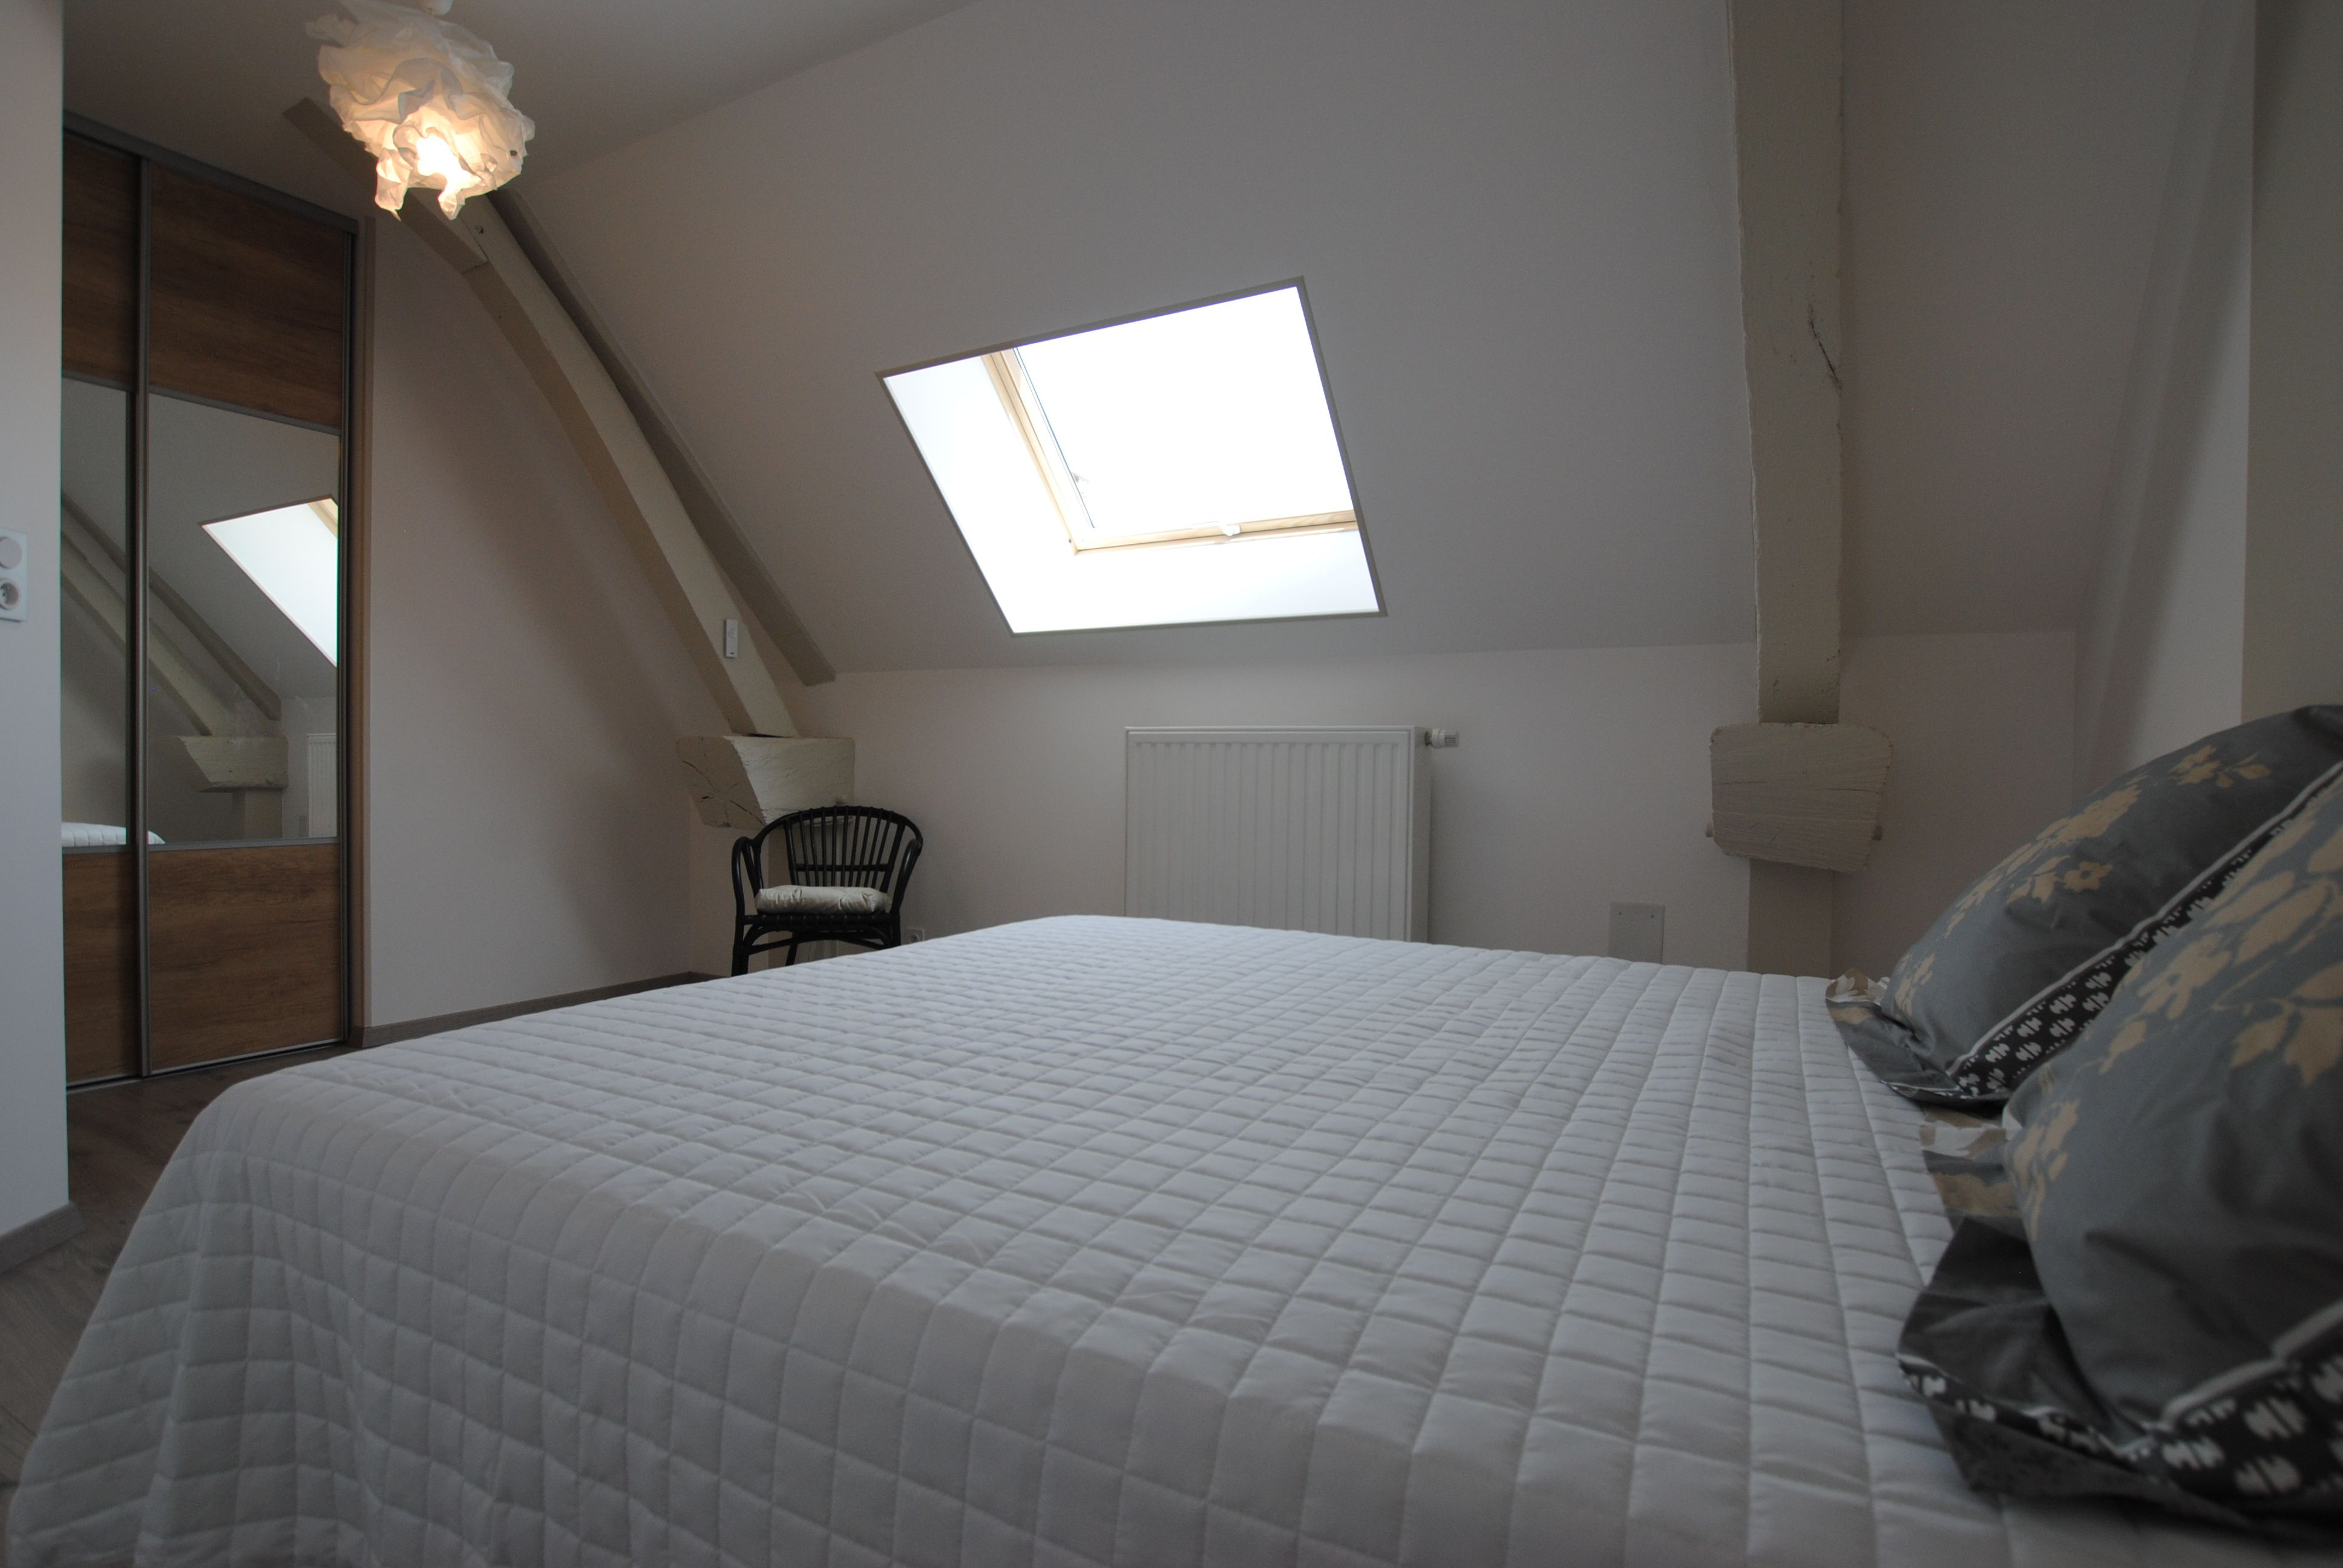 51G496 - Igny Comblizy - L'Epi Doré - Chambre beige (1er étage)